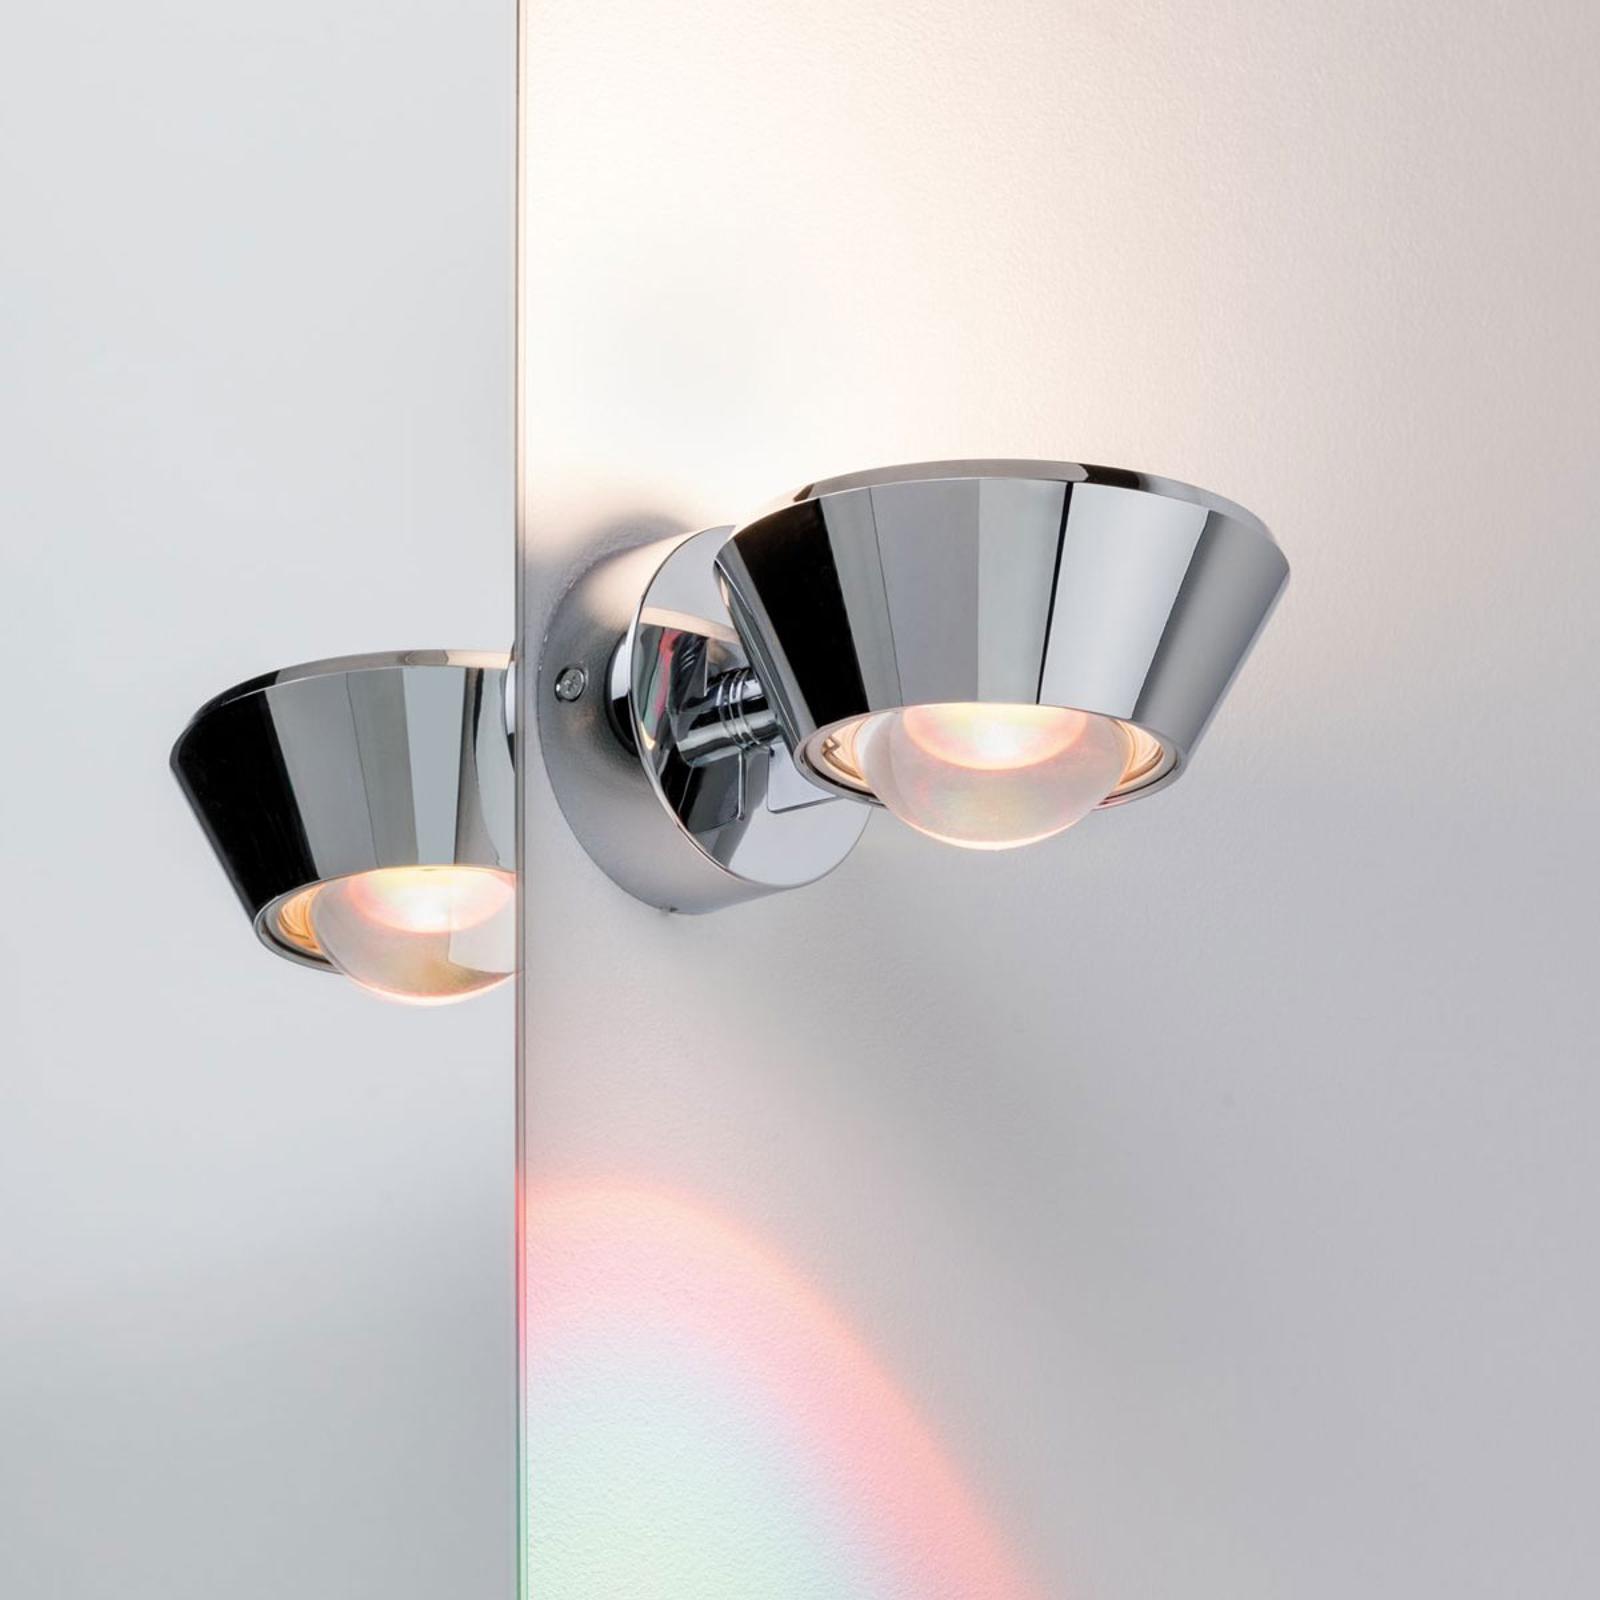 Paulmann Sabik applique LED chromé